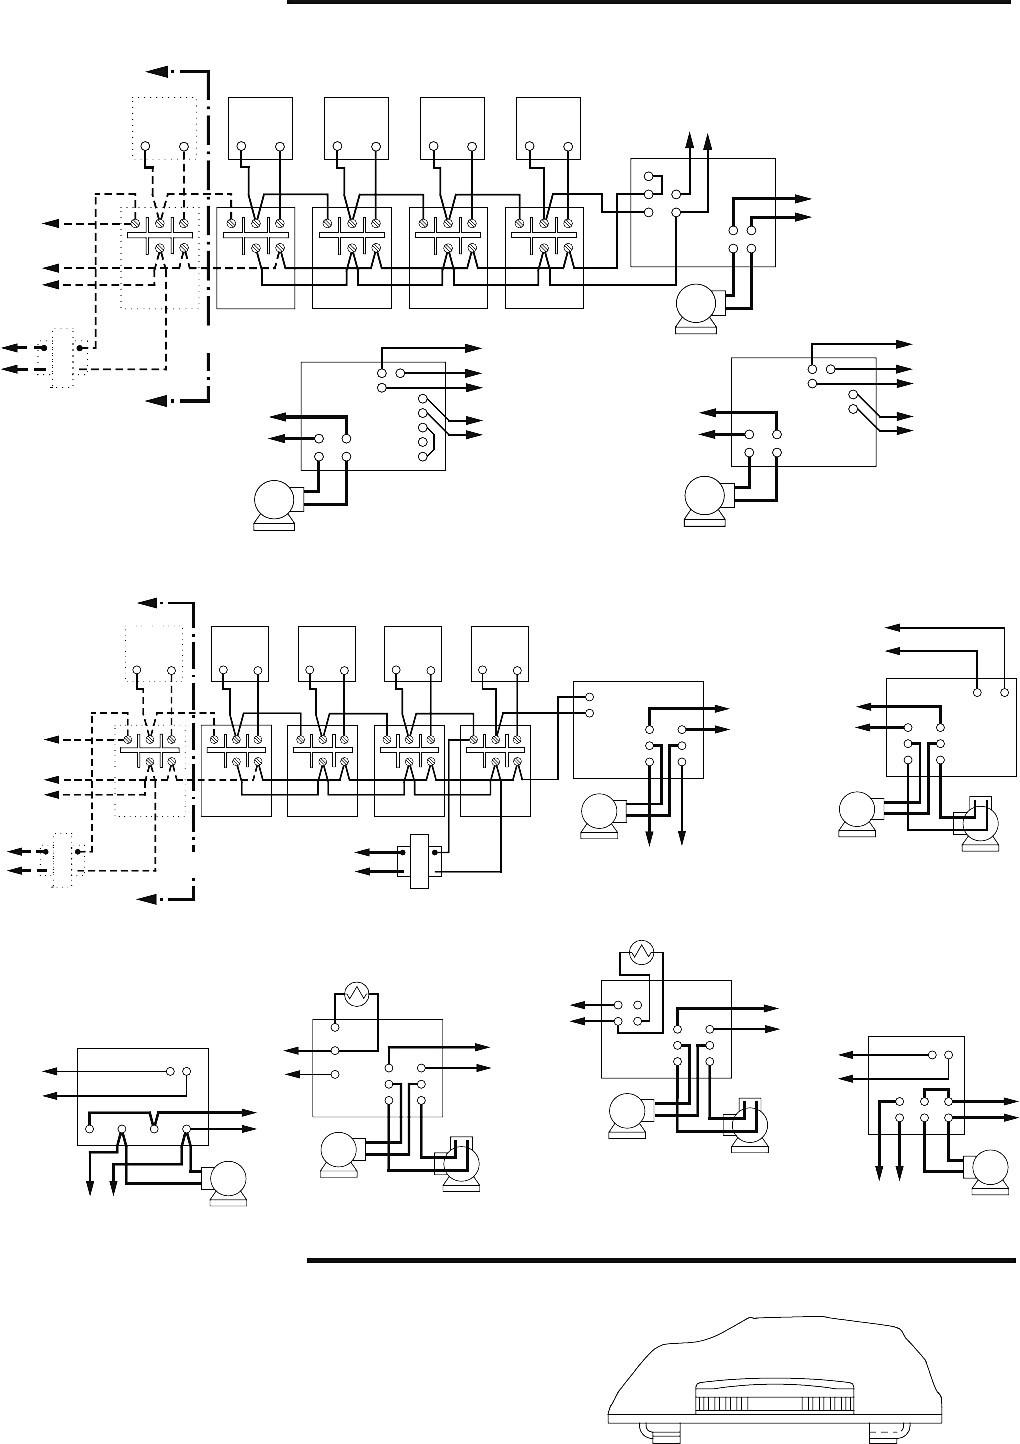 hight resolution of white rodgers aquastat wiring diagram wiring diagrams rh 48 shareplm de white rodgers 1361 zone valve wiring diagrams white rodgers zone valve diagram